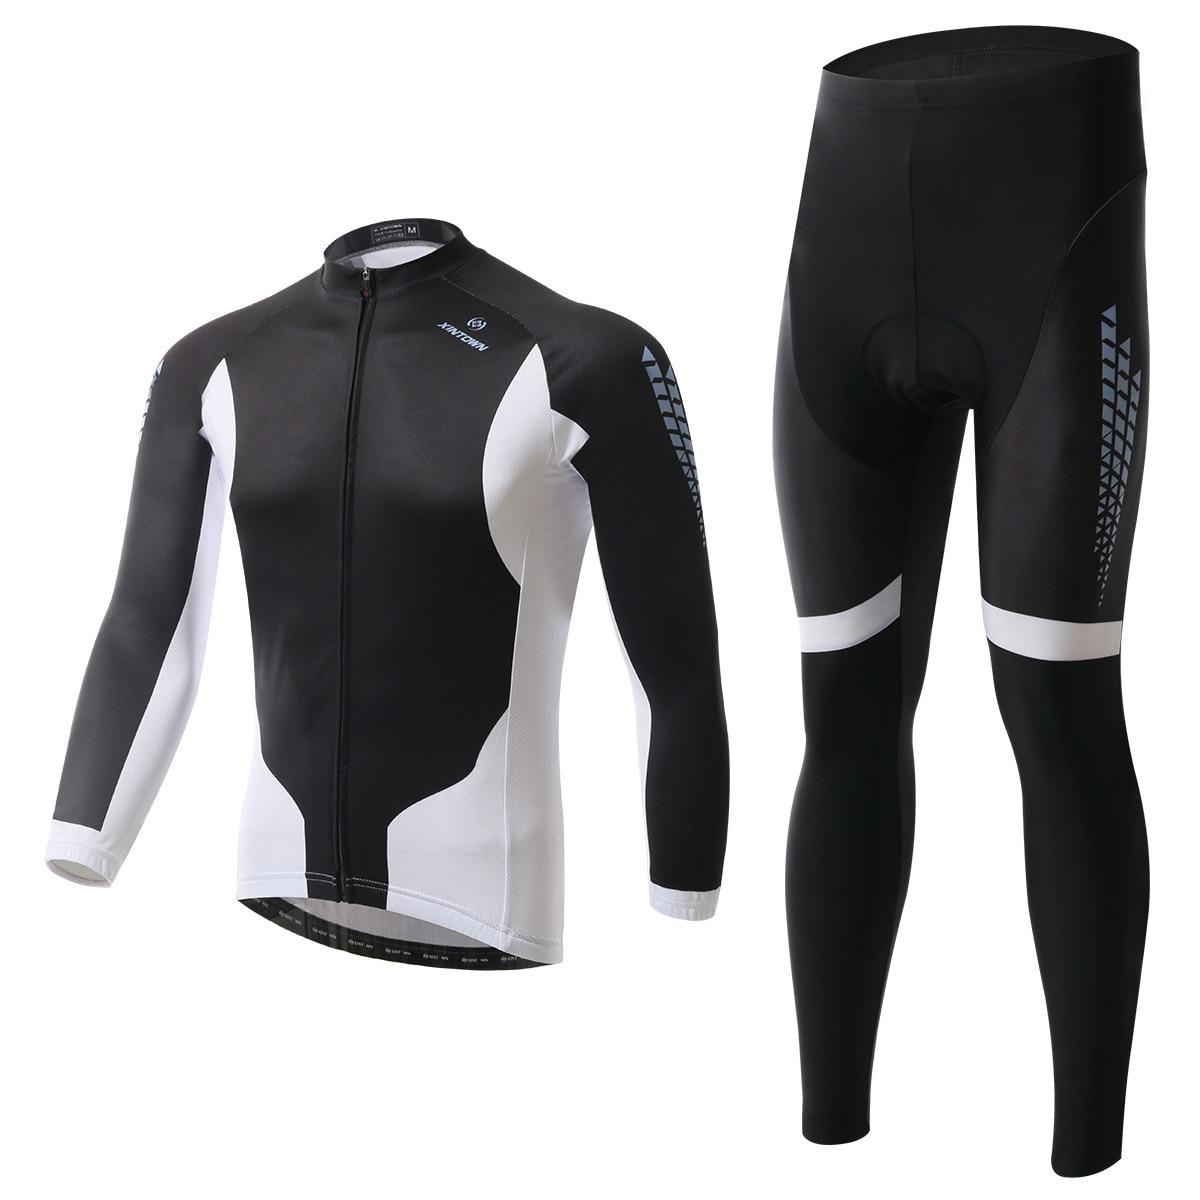 BOODUN Black Dukes Riding Long Sleeve Bicycle Serve Catch Down Windbreak Keep Warm Function Underwear